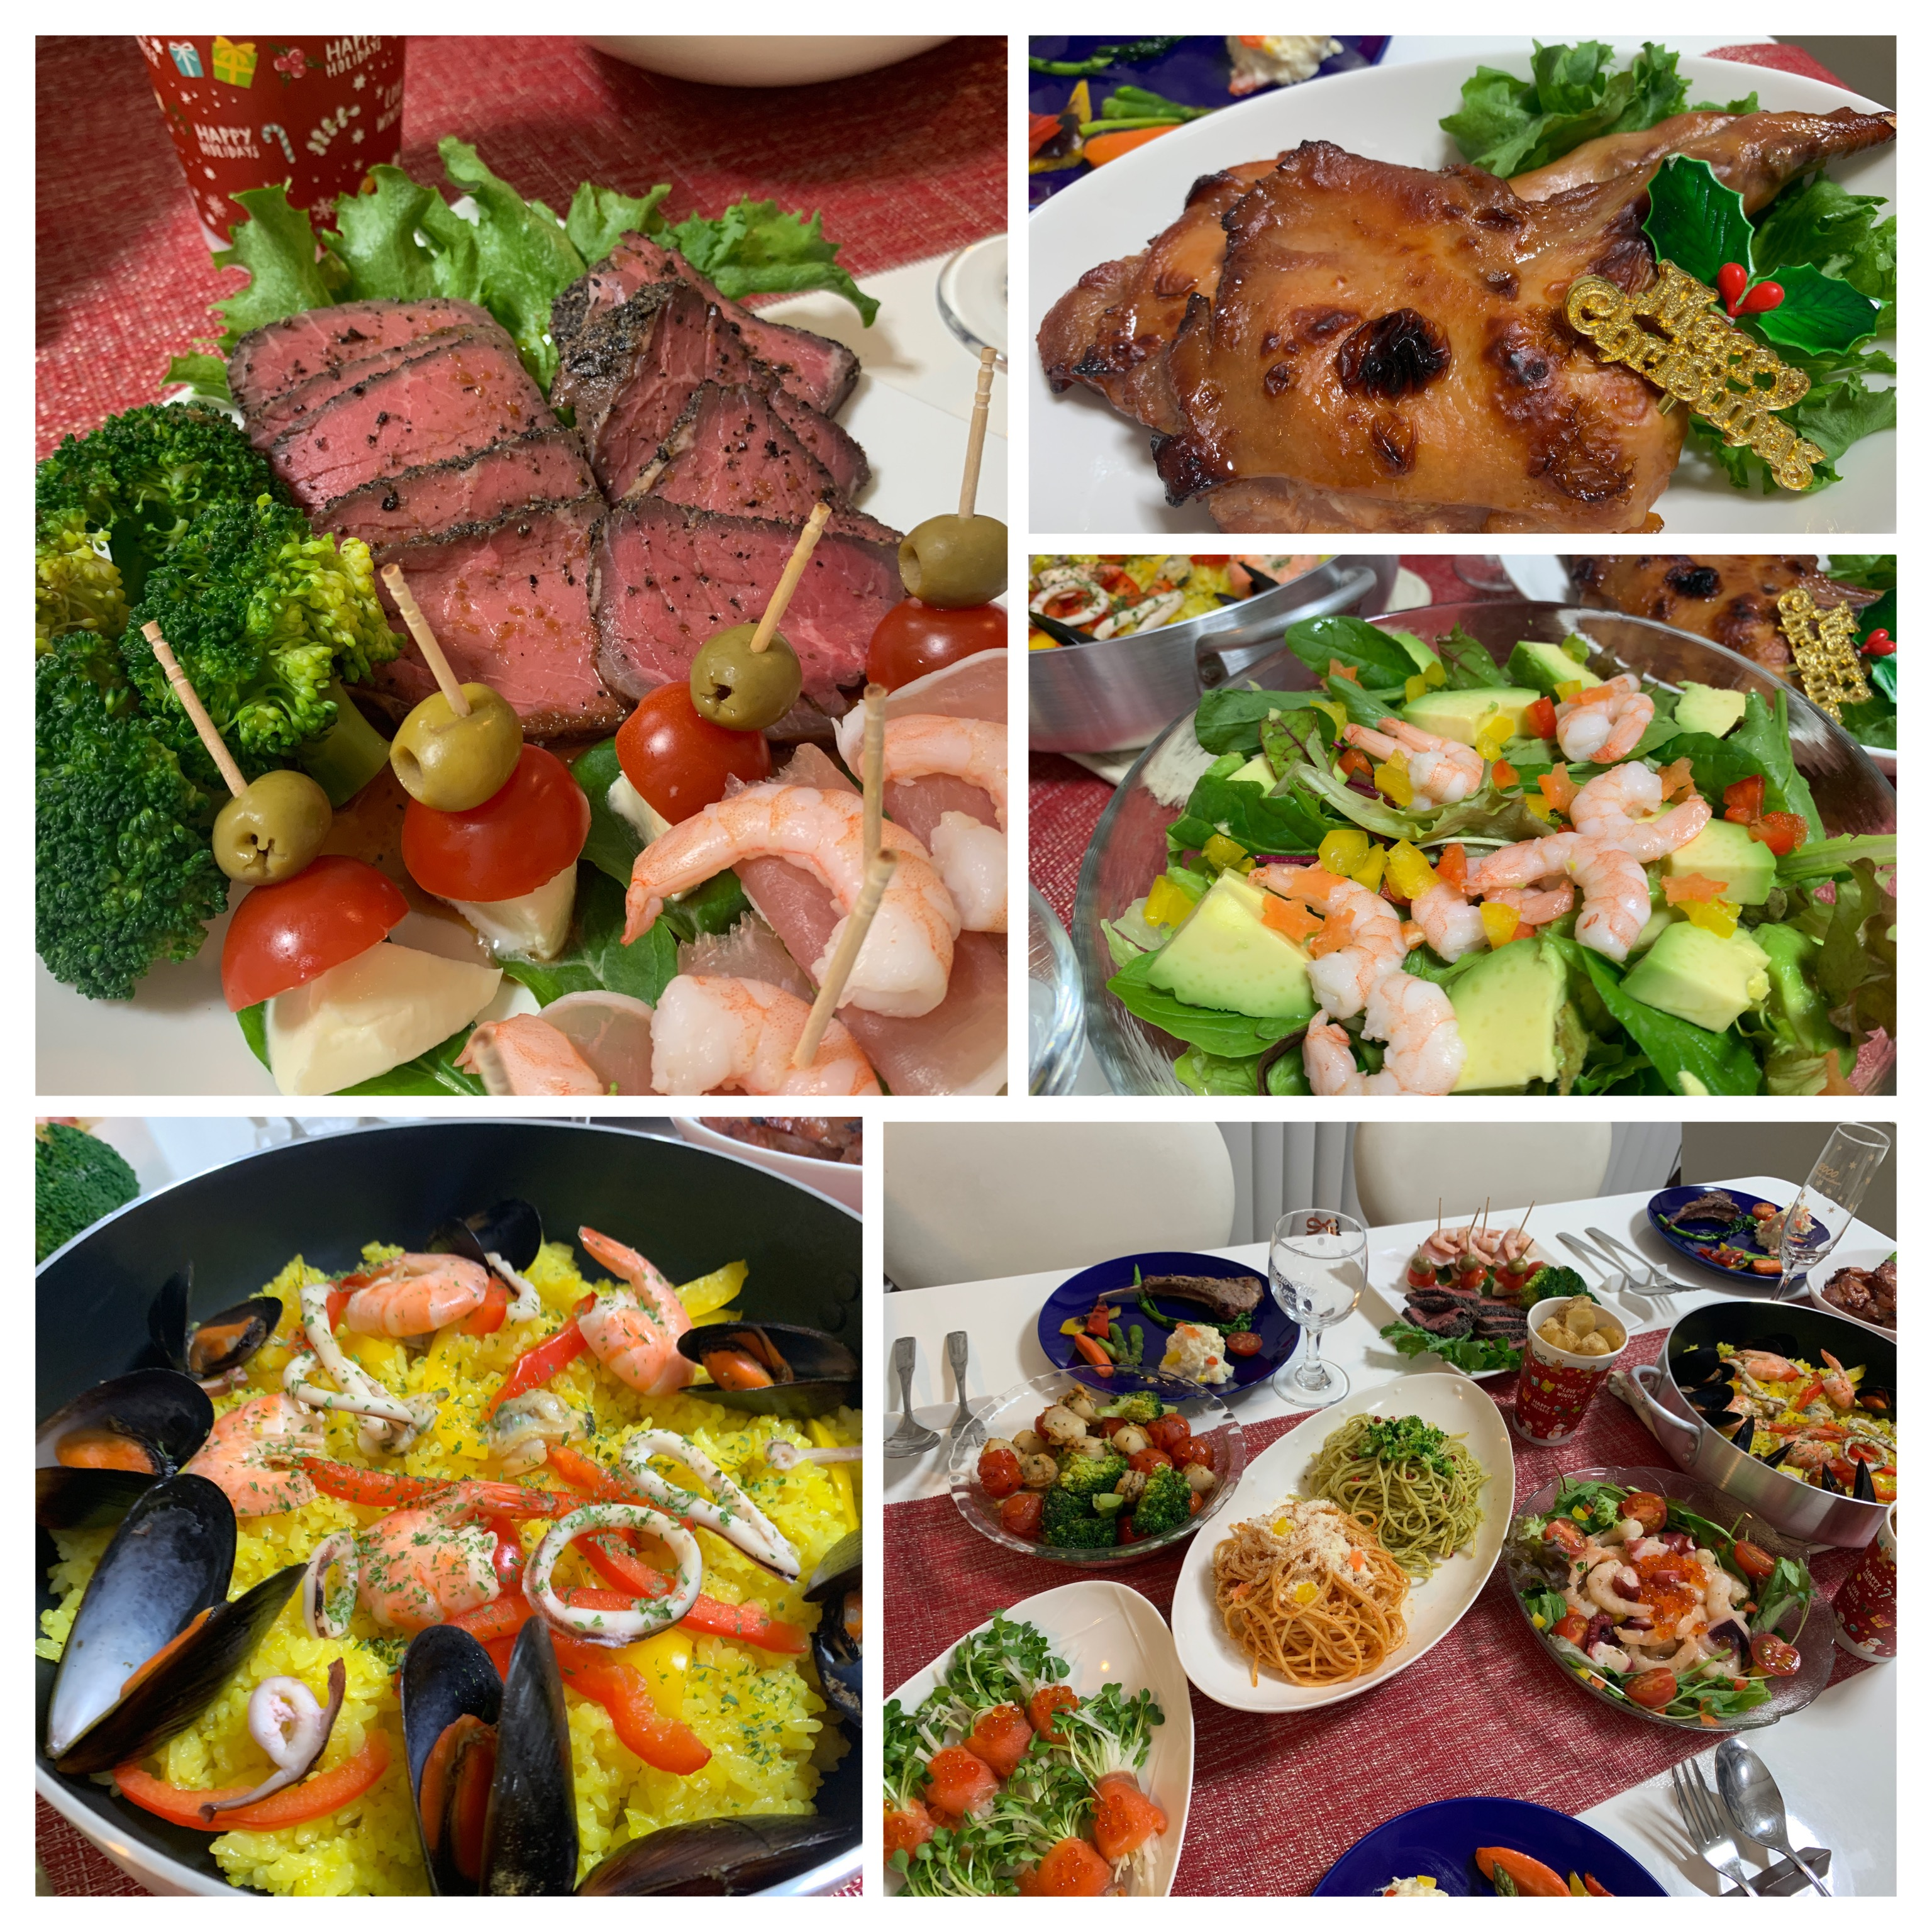 Cenbless 成増フェイシャル&ネイルサロン サロンオーナーの日常!お料理作って家族でクリスマスパーティー